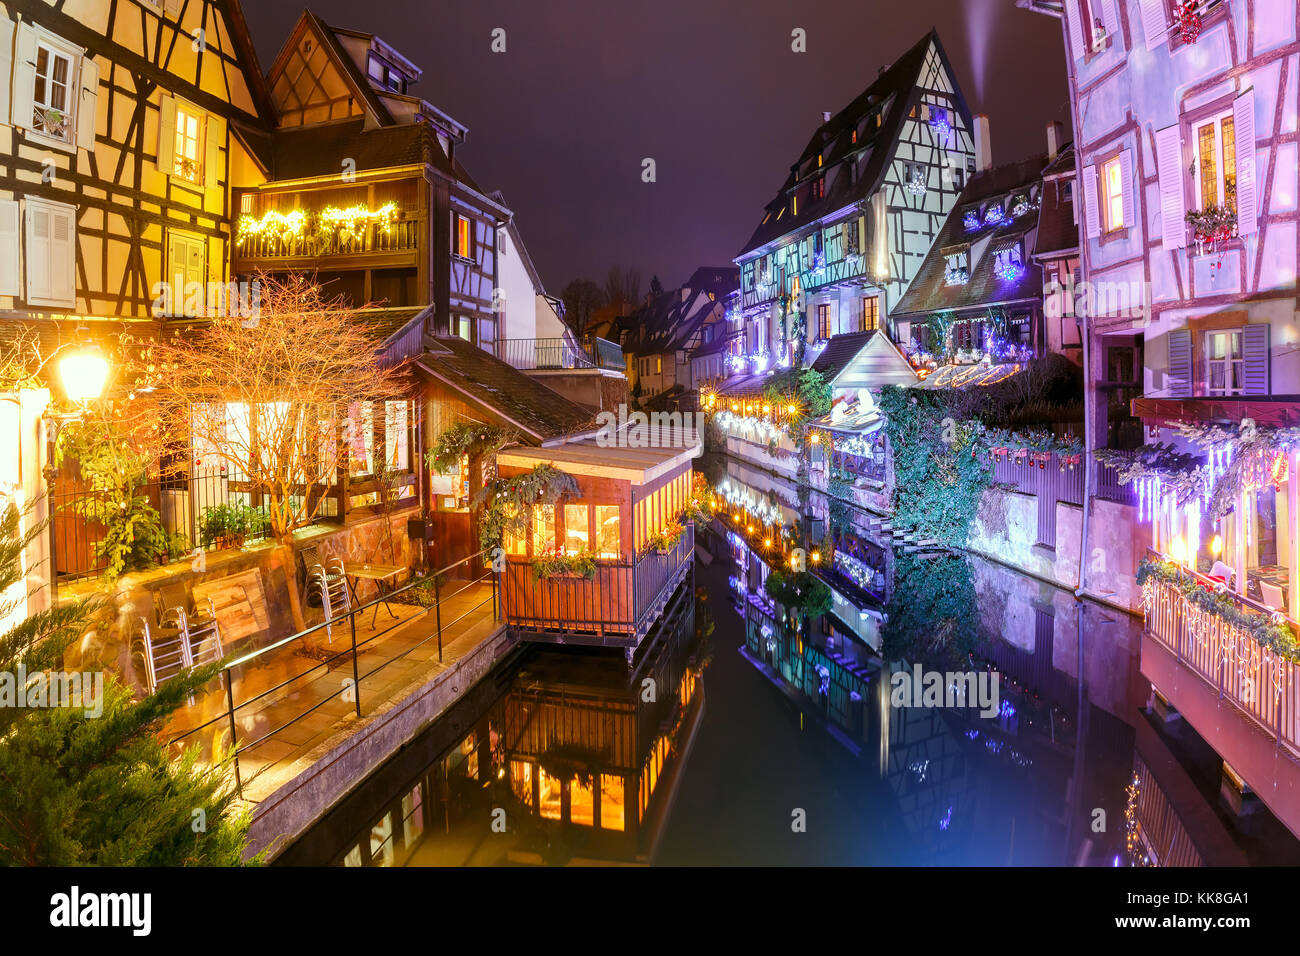 Christmas Little Venice in Colmar, Alsace, France - Stock Image